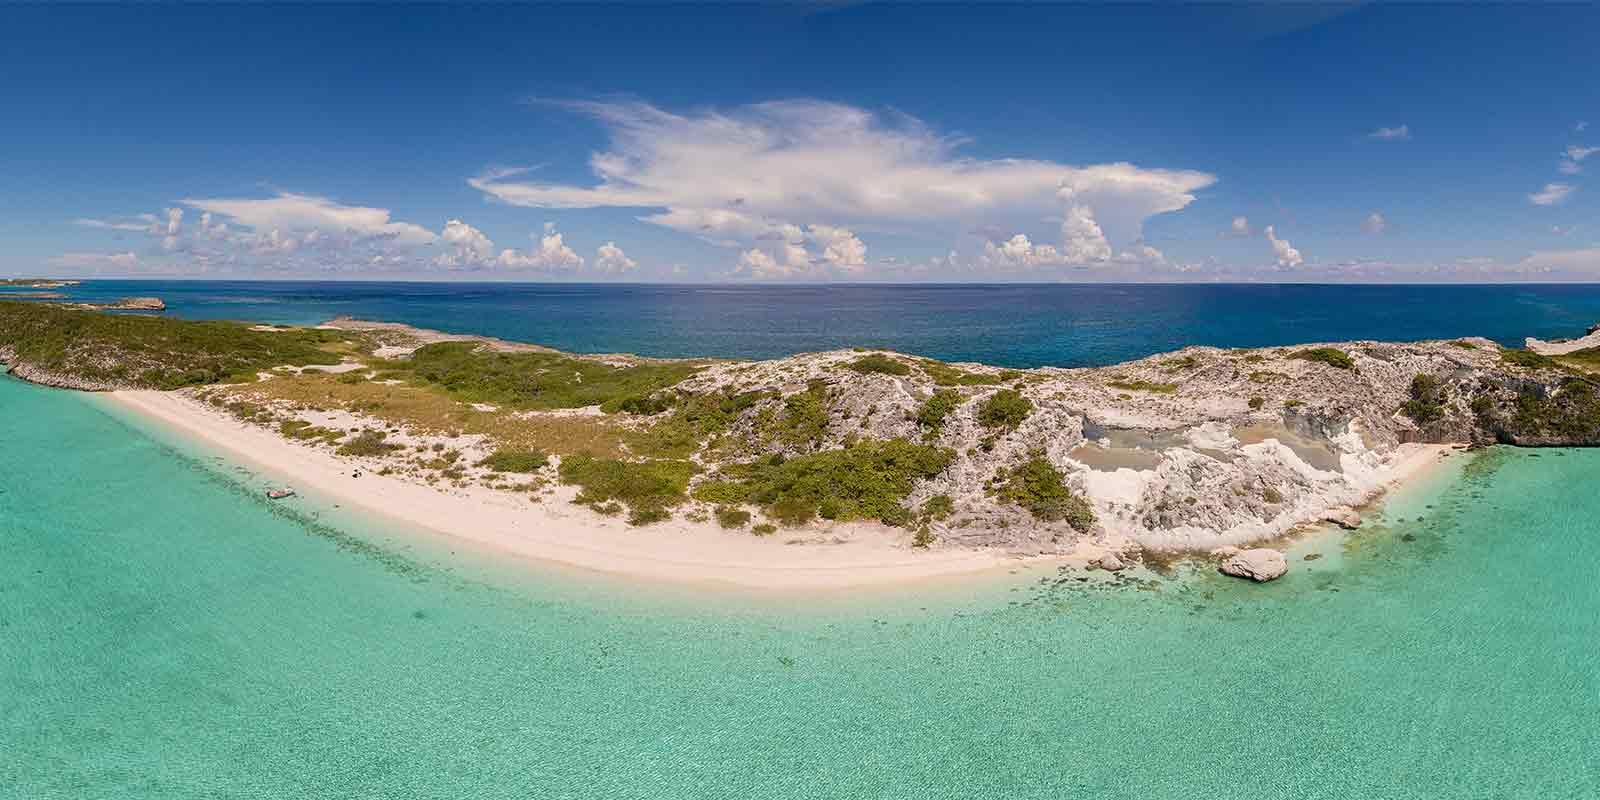 Panorama of beach in Bahamas